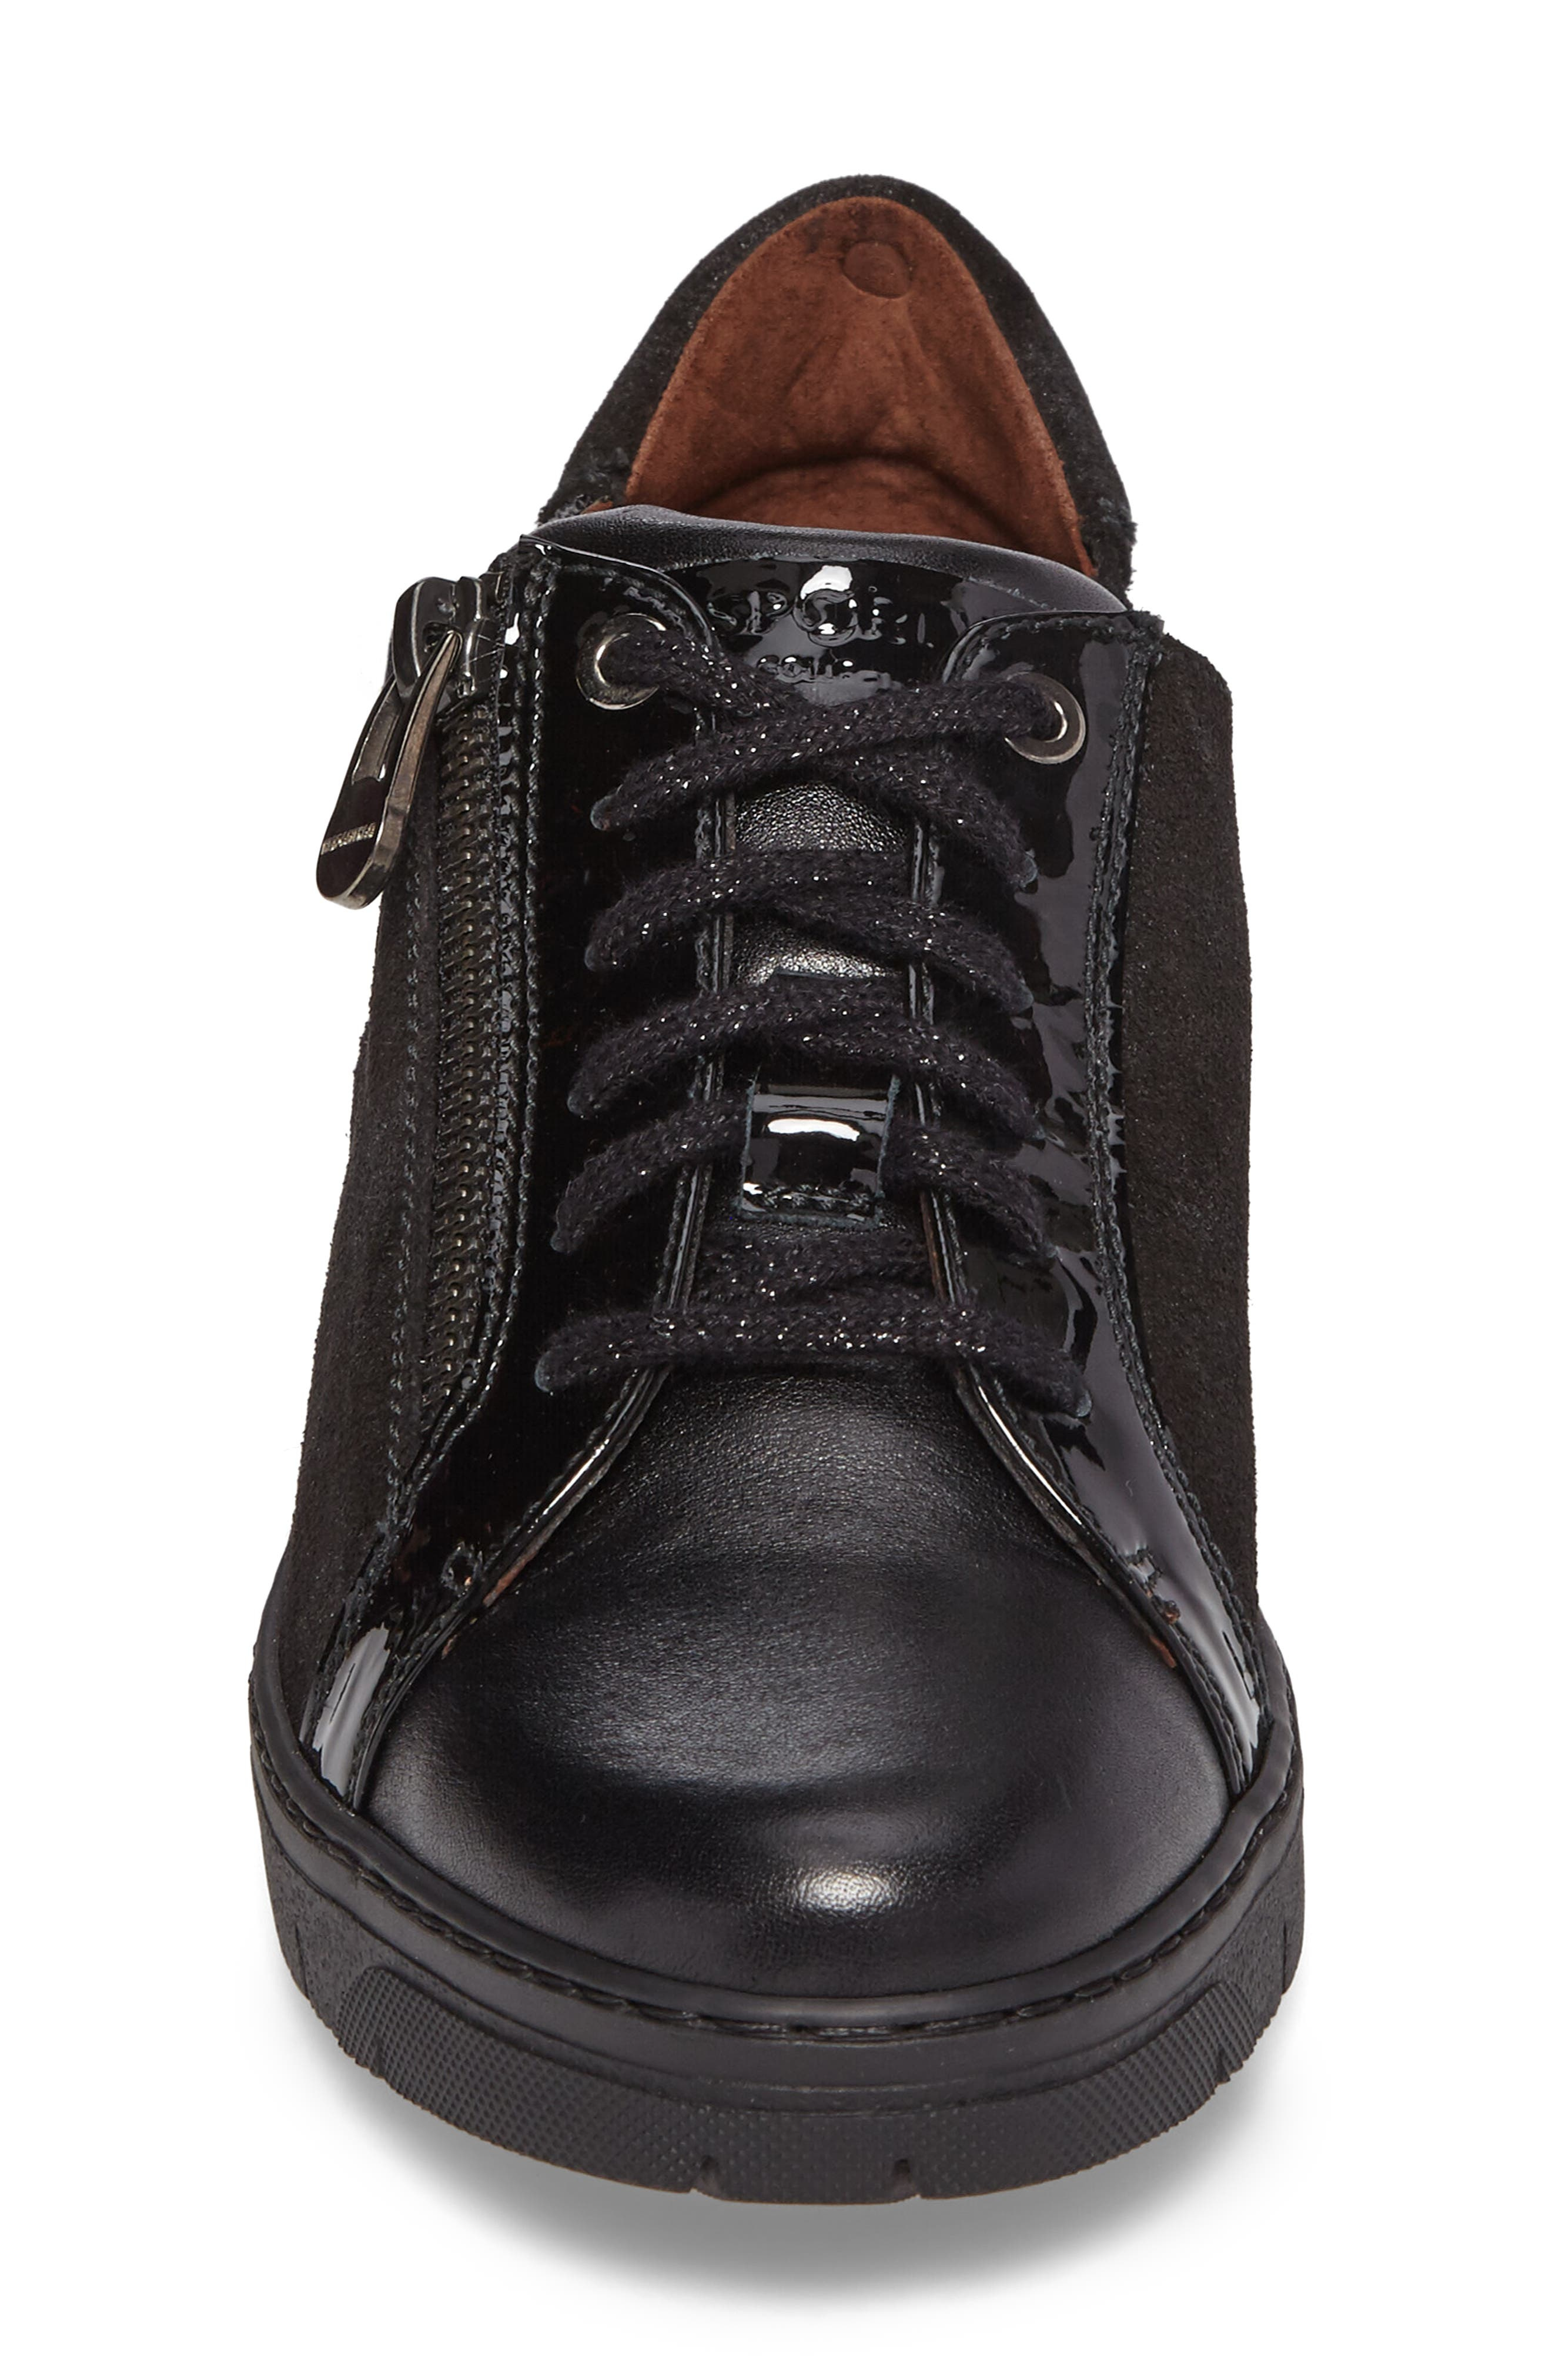 Sammi Sneaker,                             Alternate thumbnail 4, color,                             001